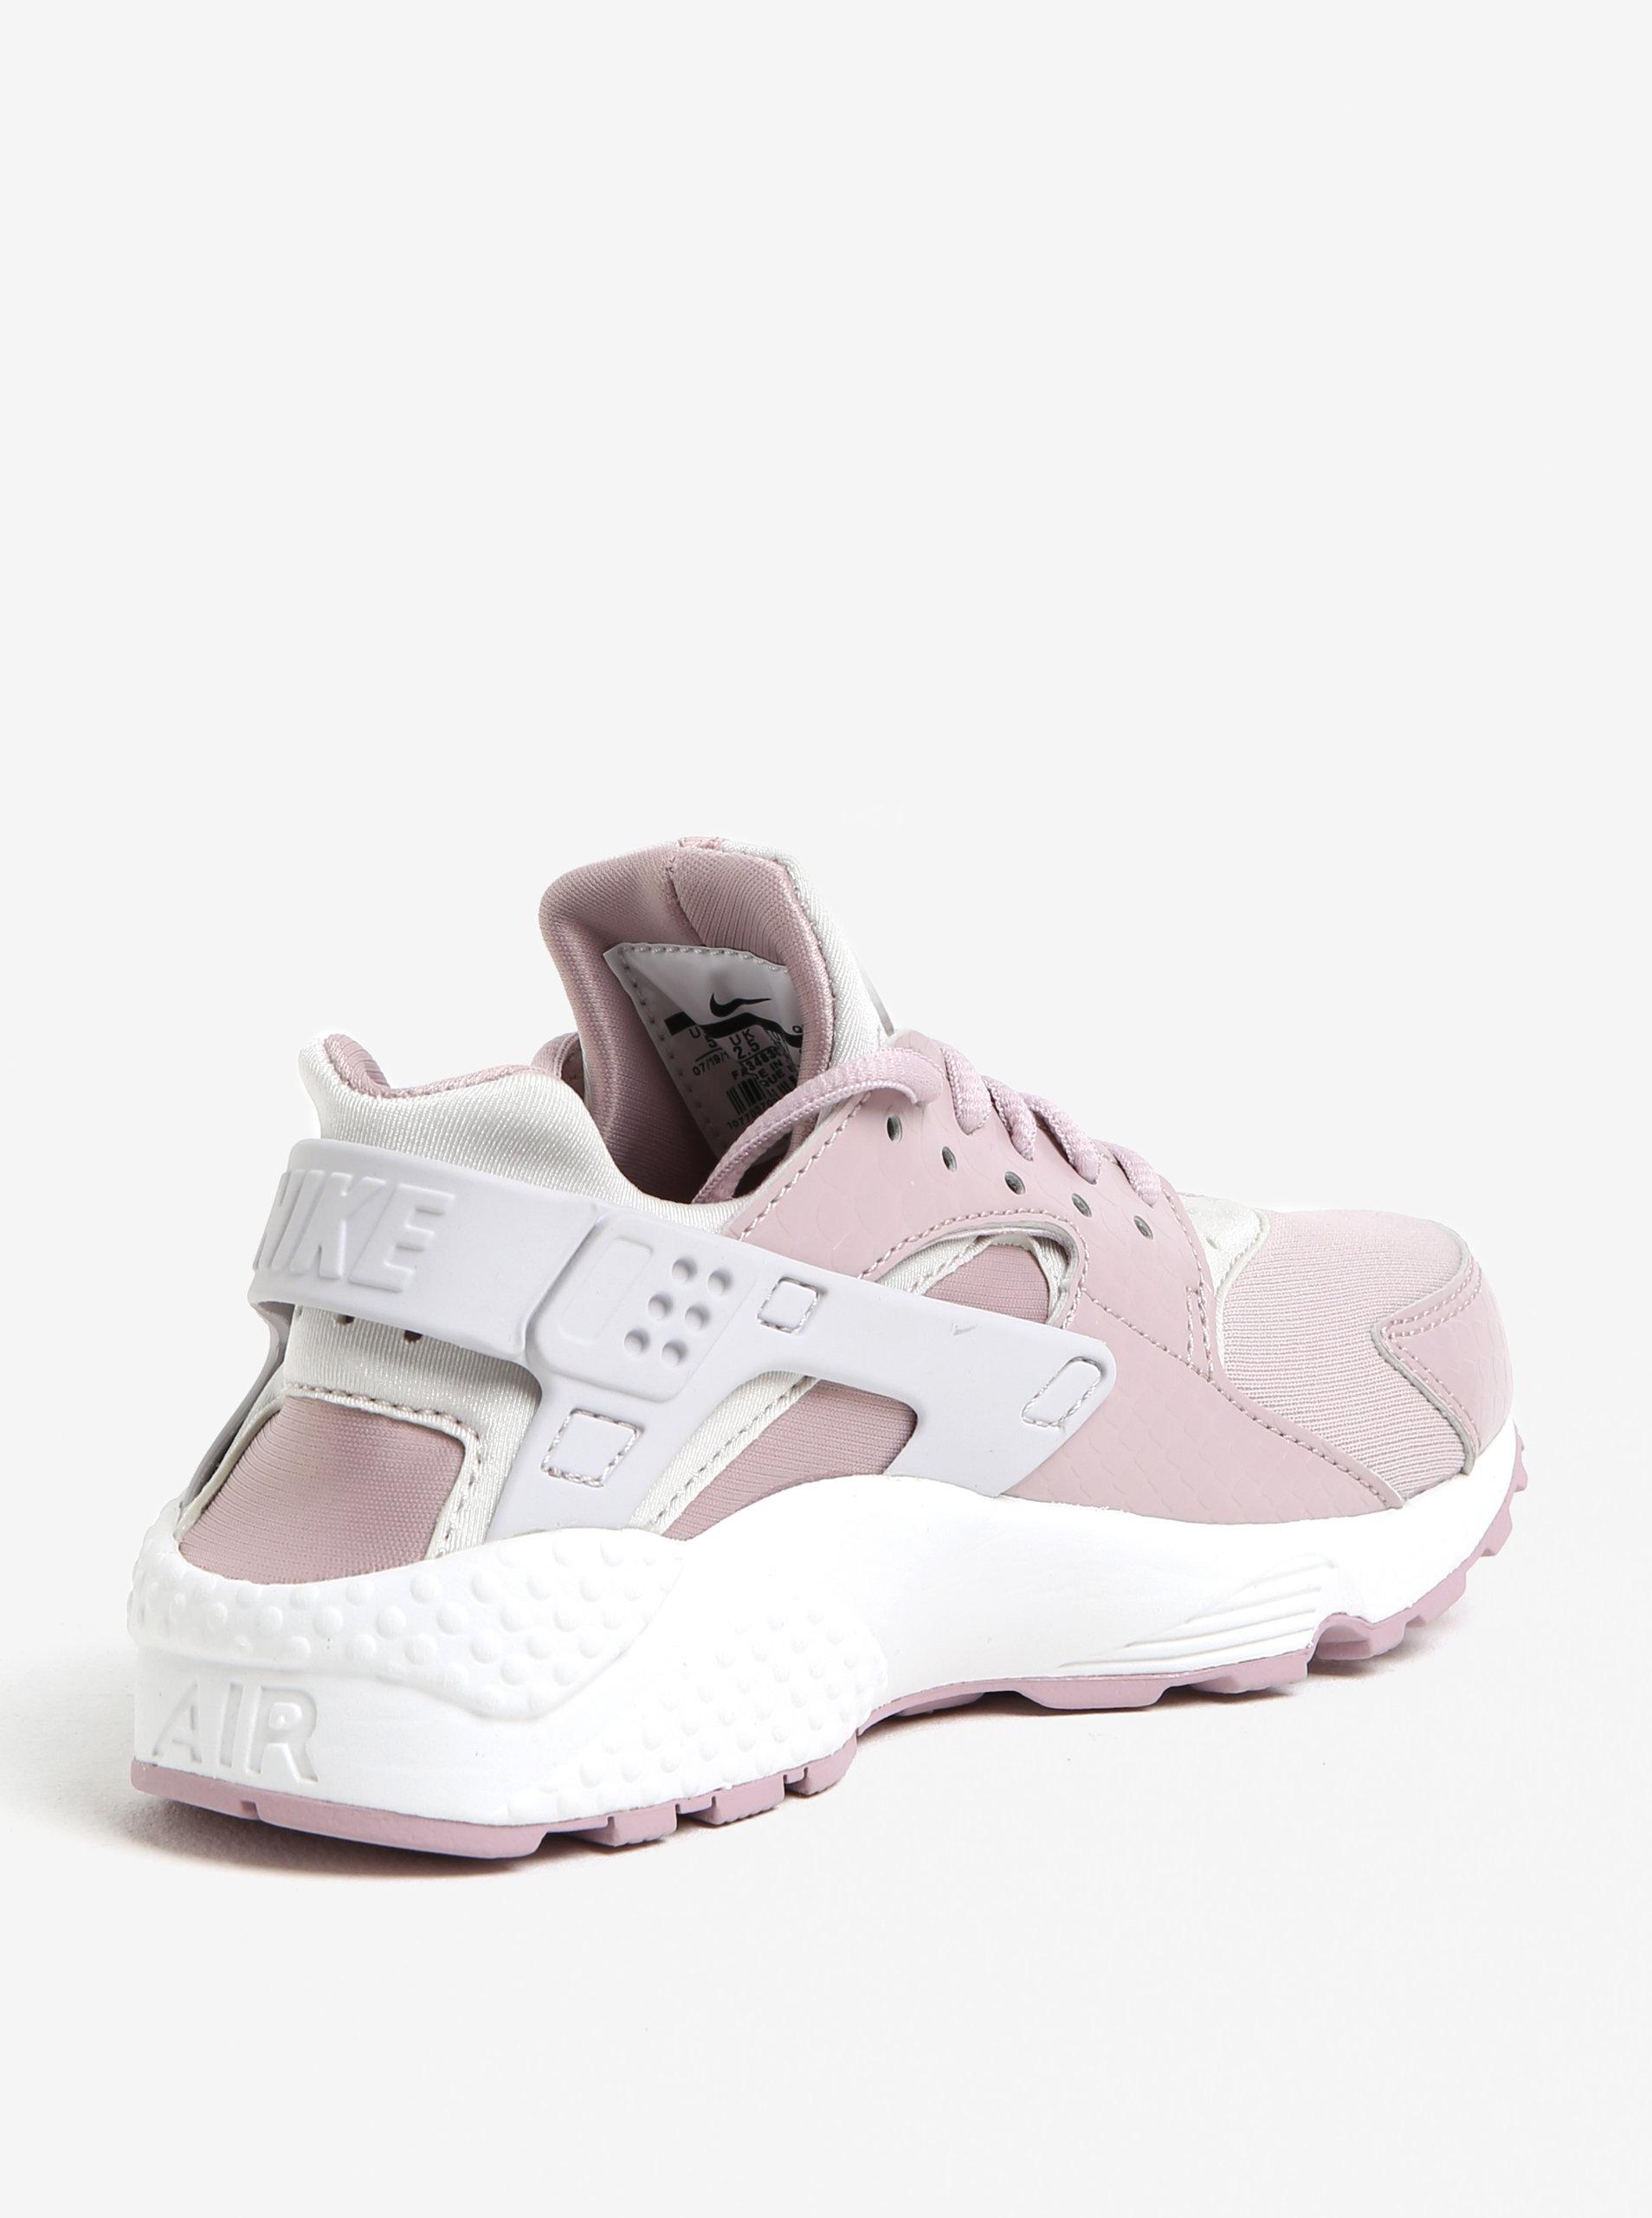 Starorůžové dámské tenisky Nike Air Huarache Run ... 949af6a1a36